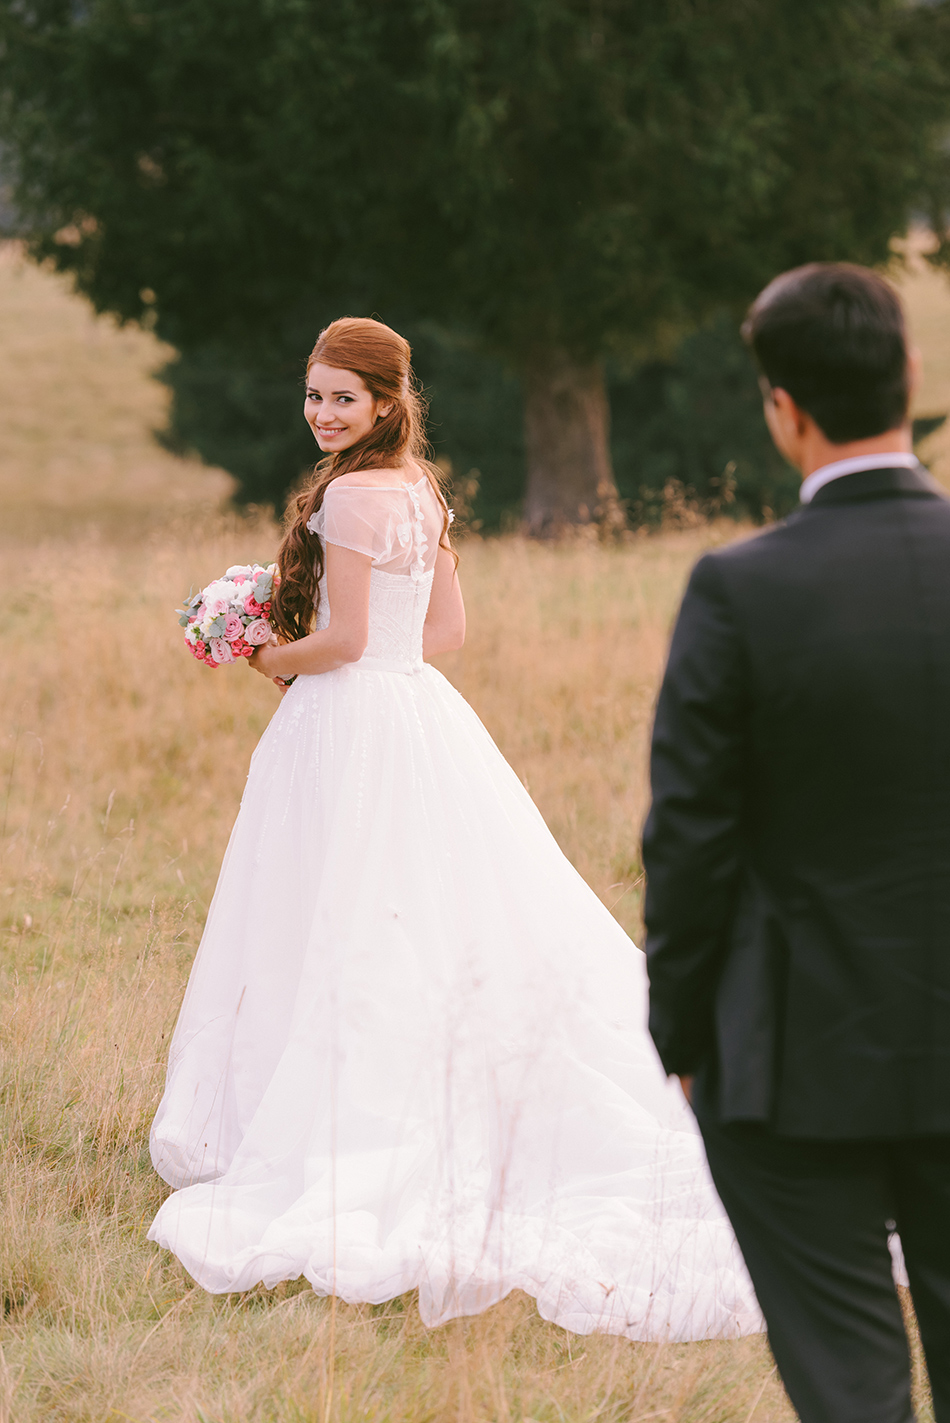 AD Passion Photography | fotograf-nunta-brasov-poiana-brasov-fotograf-profesionist_lorena-cristi_0108 | Adelin, Dida, fotograf profesionist, fotograf de nunta, fotografie de nunta, fotograf Timisoara, fotograf Craiova, fotograf Bucuresti, fotograf Arad, nunta Timisoara, nunta Arad, nunta Bucuresti, nunta Craiova